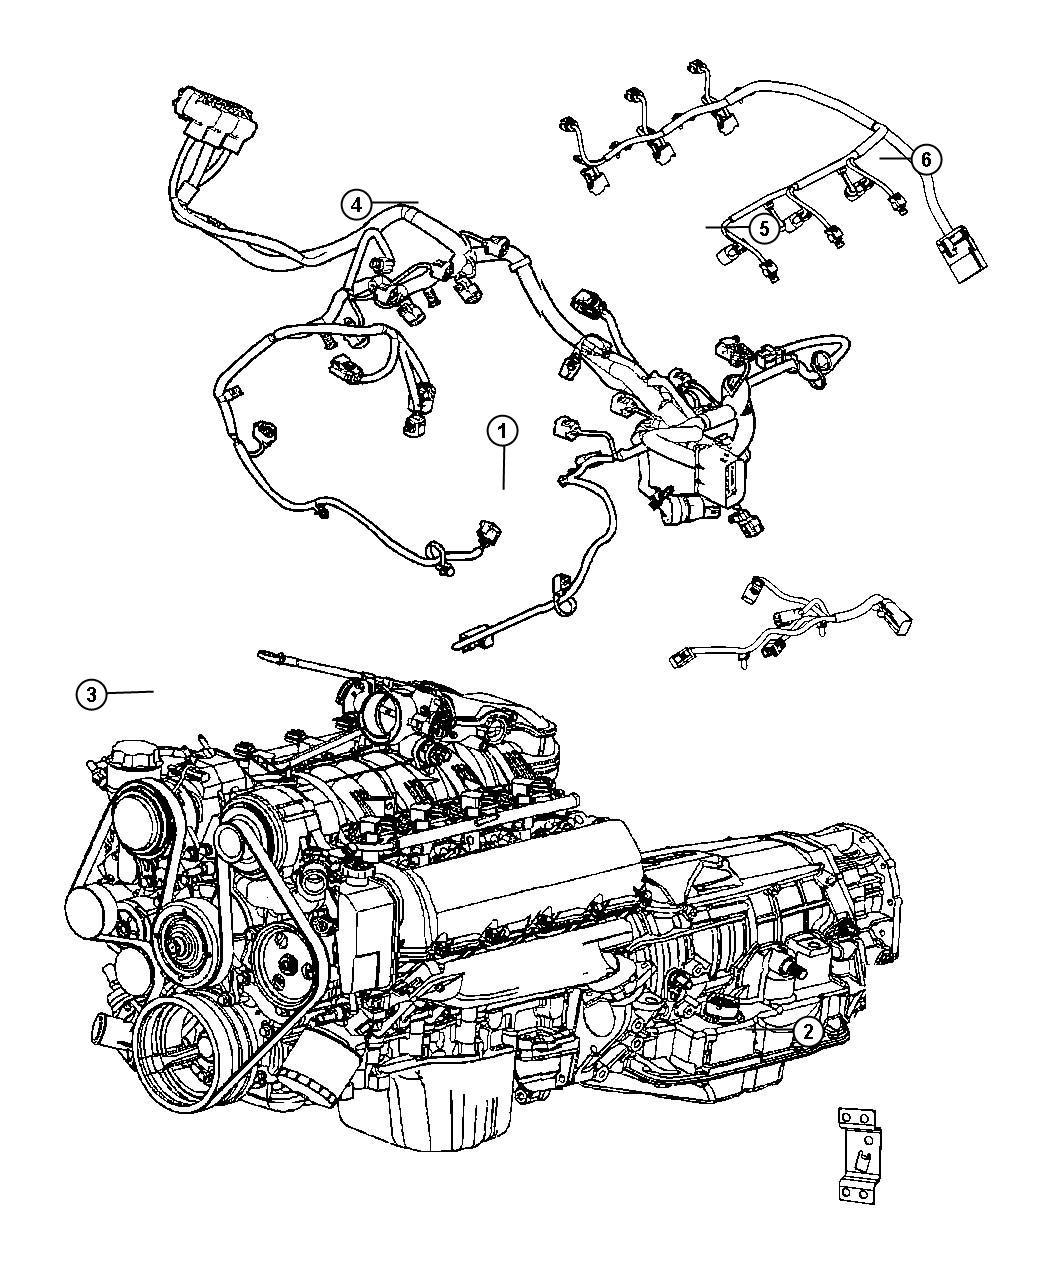 2012 Dodge Grand Caravan Crew 3 6l V6 Wiring  Injector